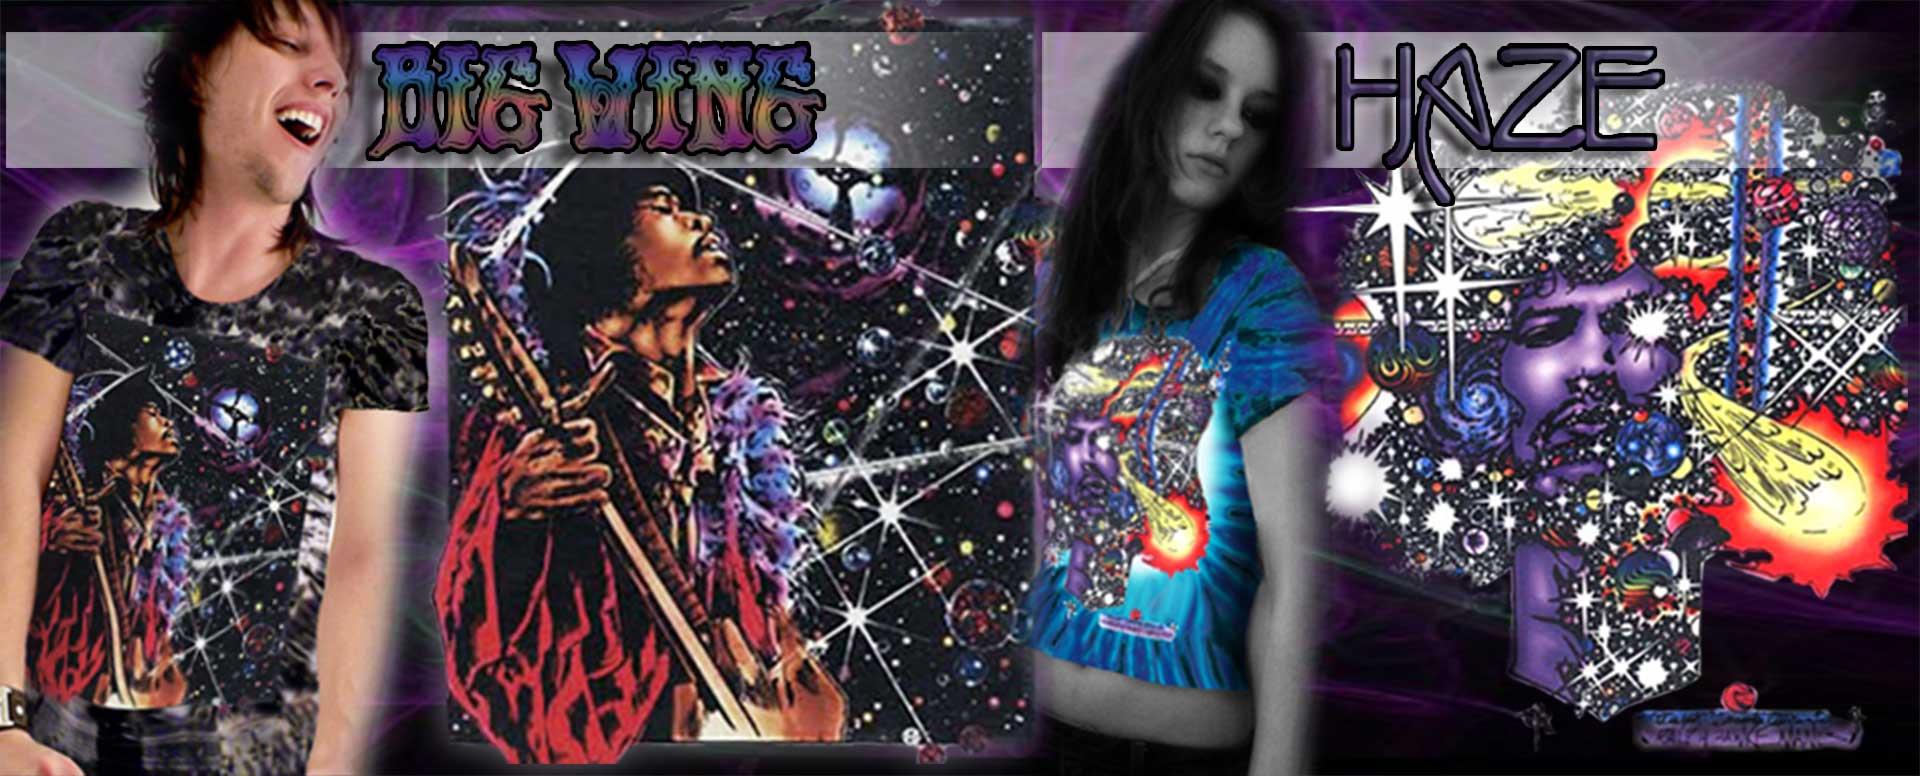 Jimi Hendrix Inspired T-shirts and Tank Tops